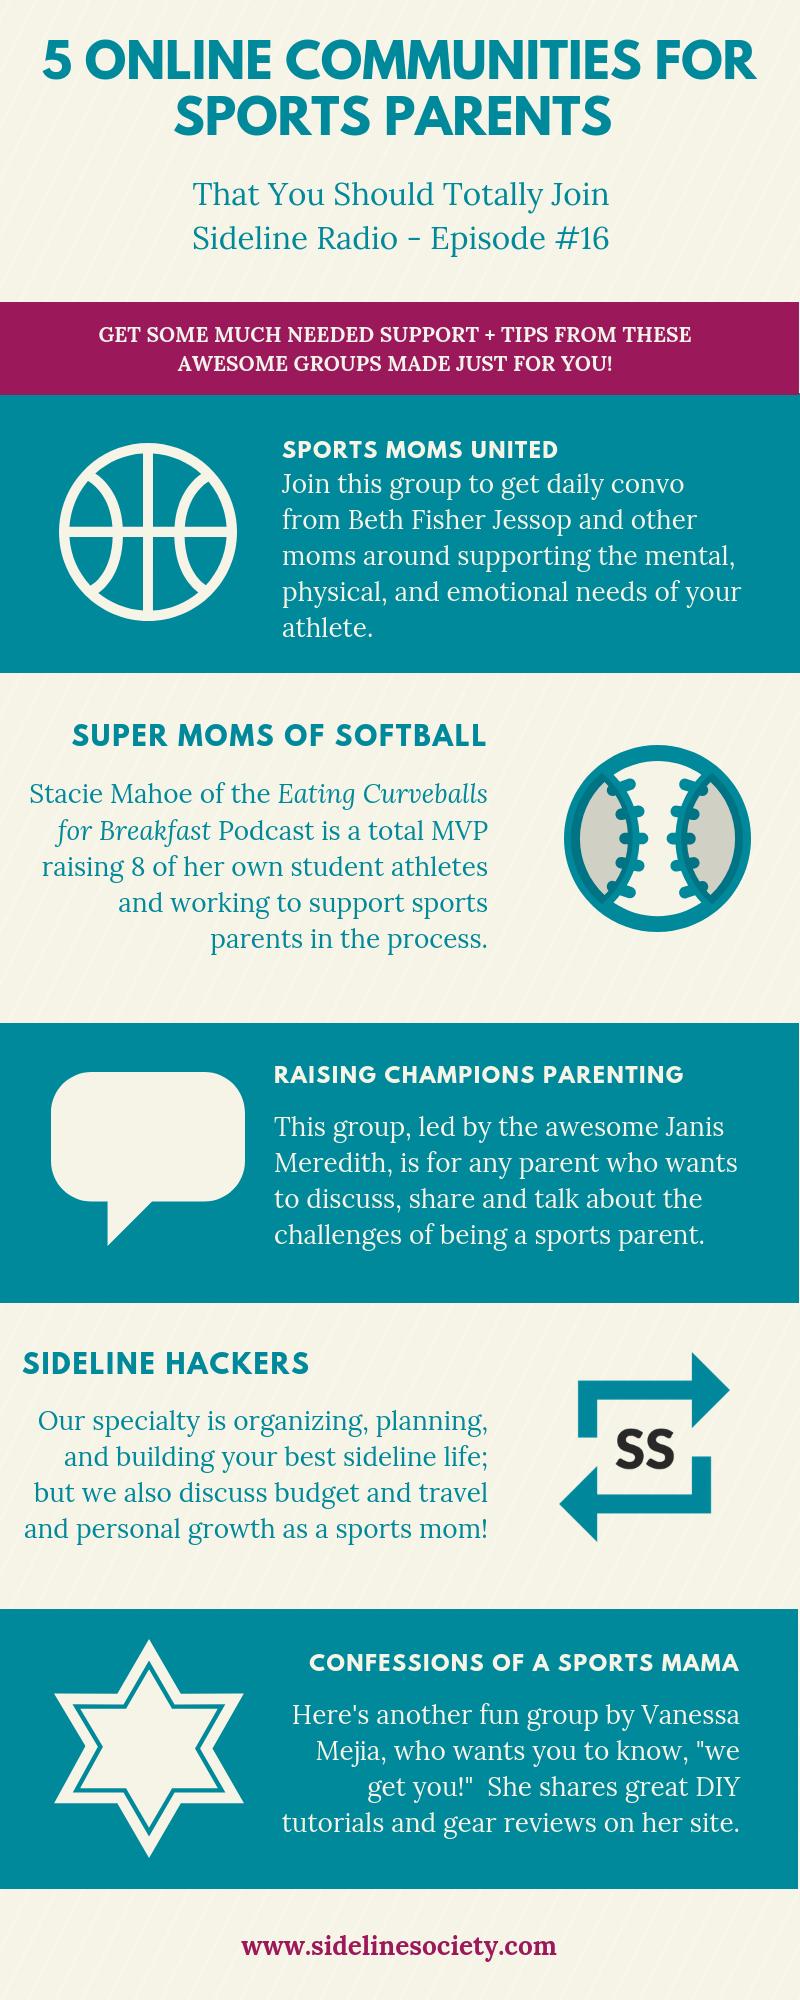 5 online communities for sports parents.png